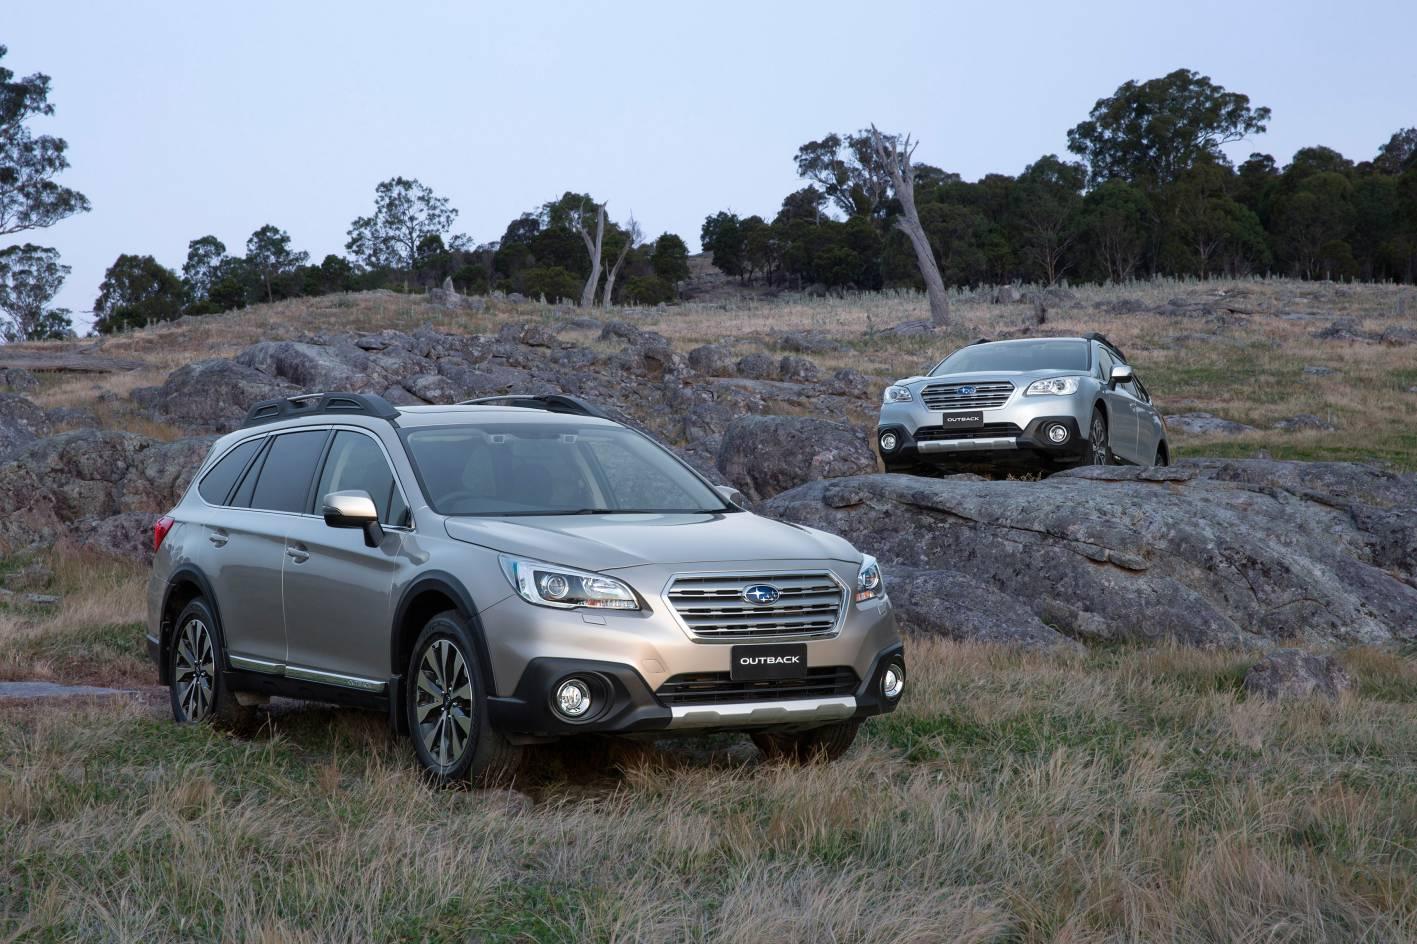 subaru cars news 2015 subaru outback on sale from 35 990. Black Bedroom Furniture Sets. Home Design Ideas